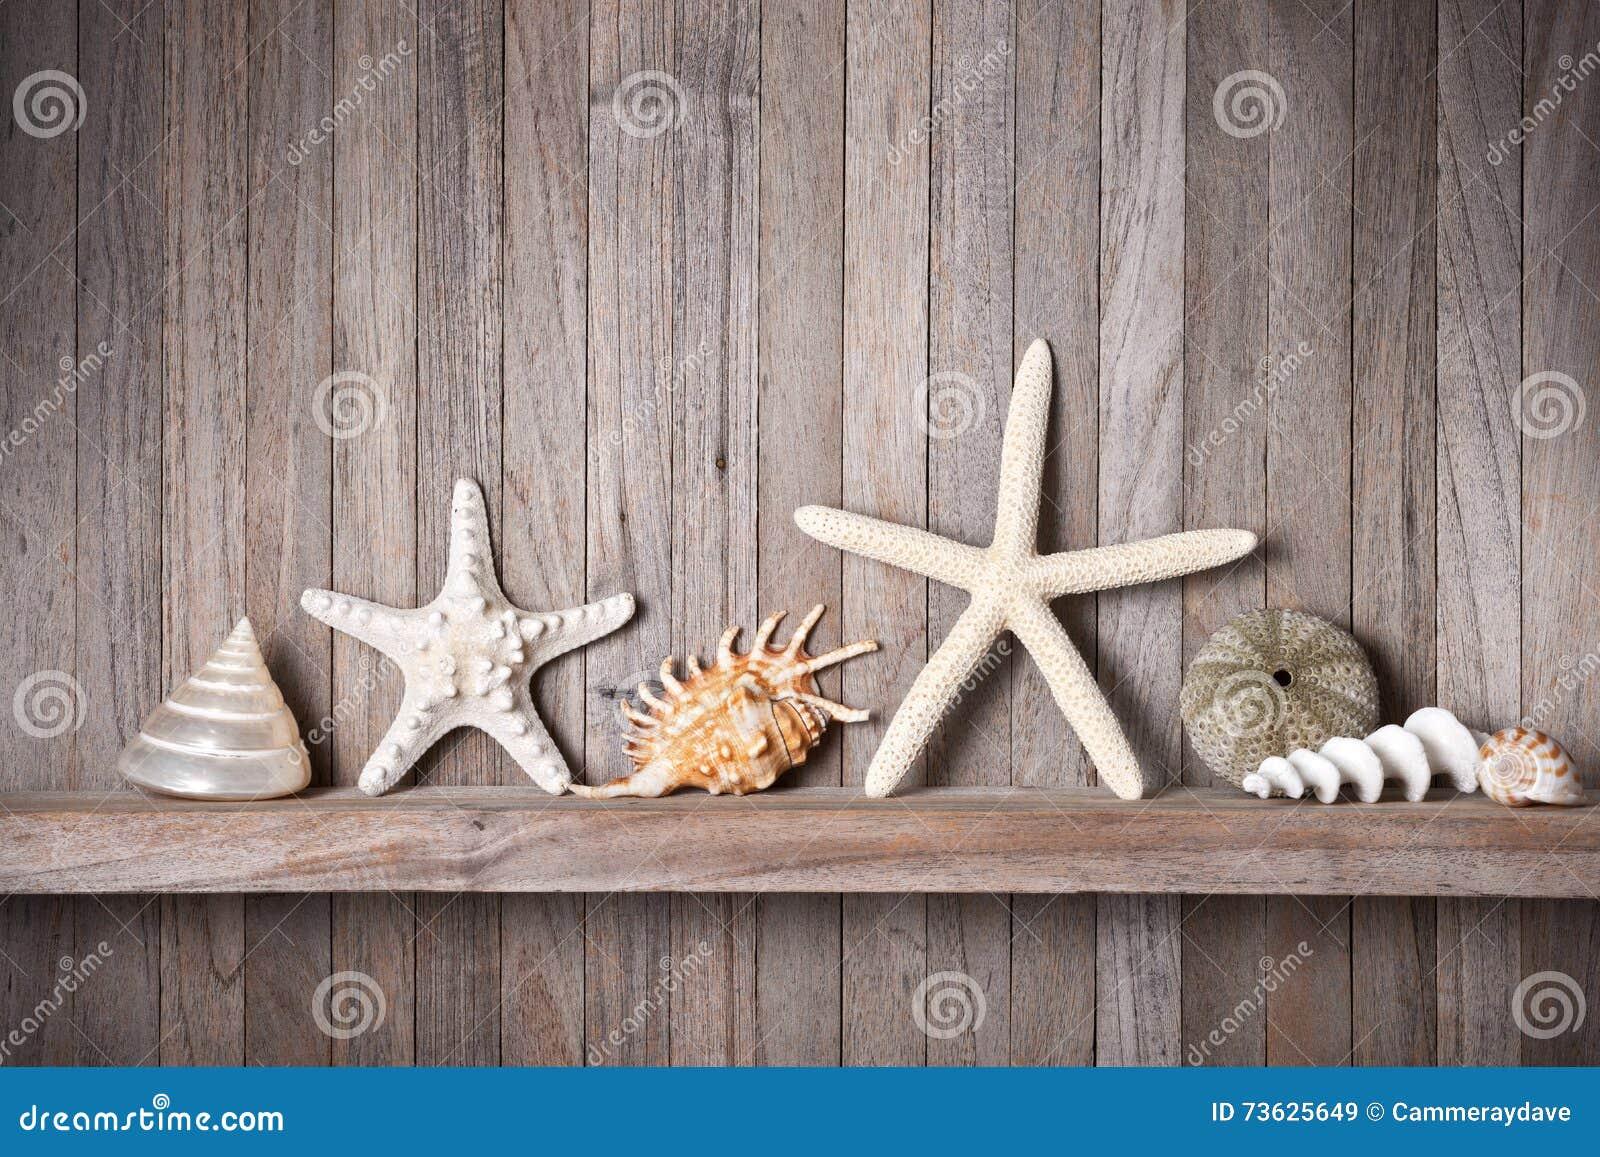 Download Shells Starfish Wood Background Stock Image